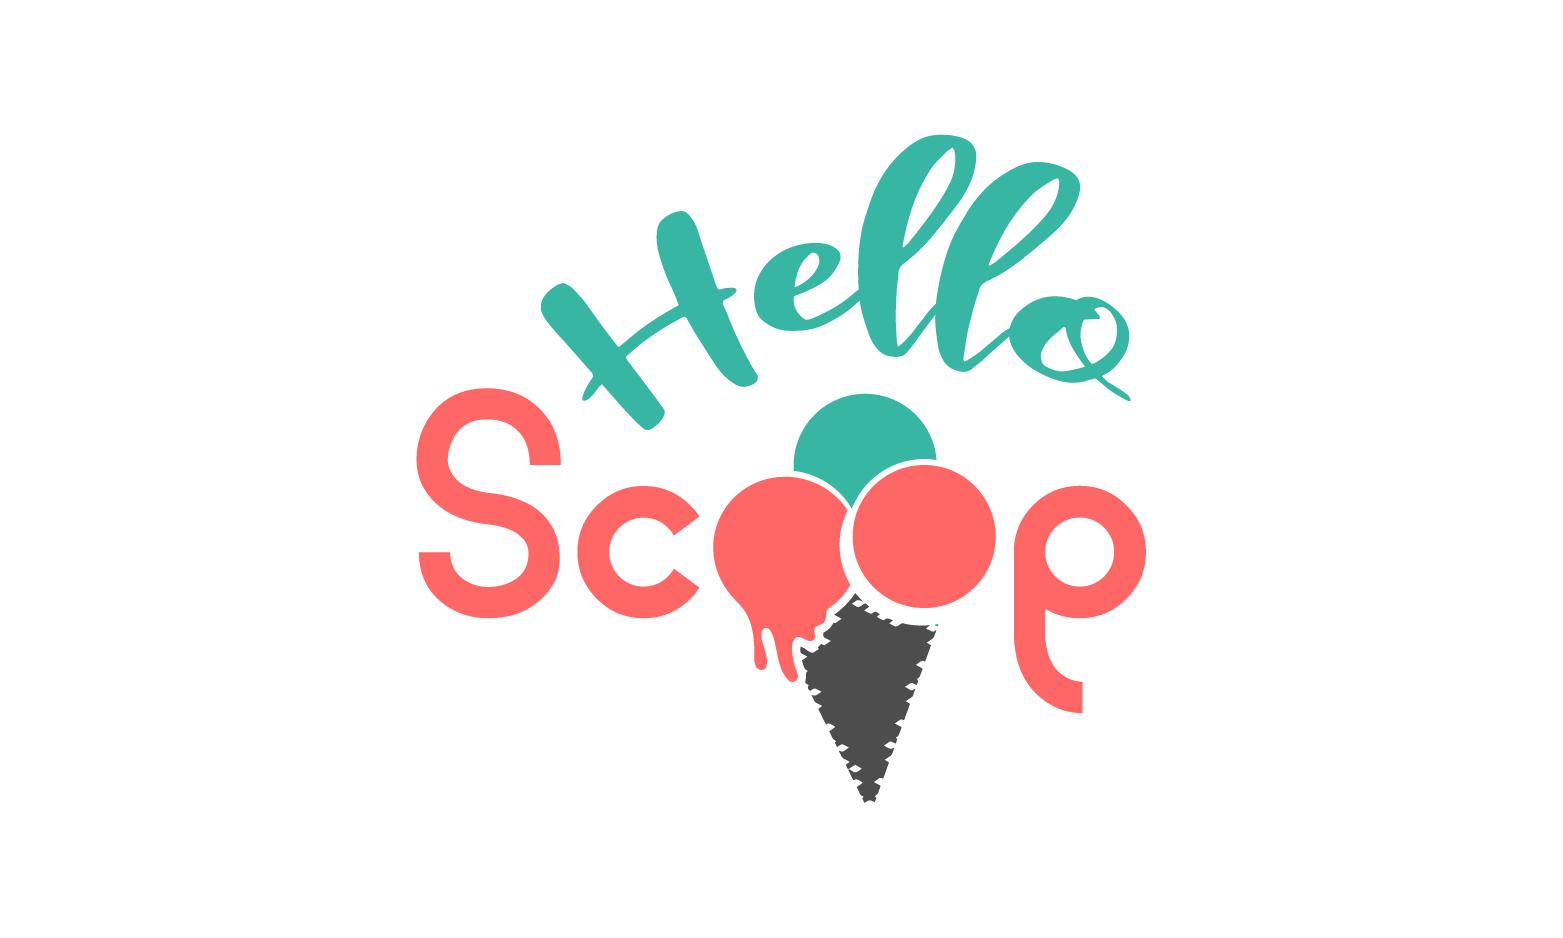 HelloScoop.com